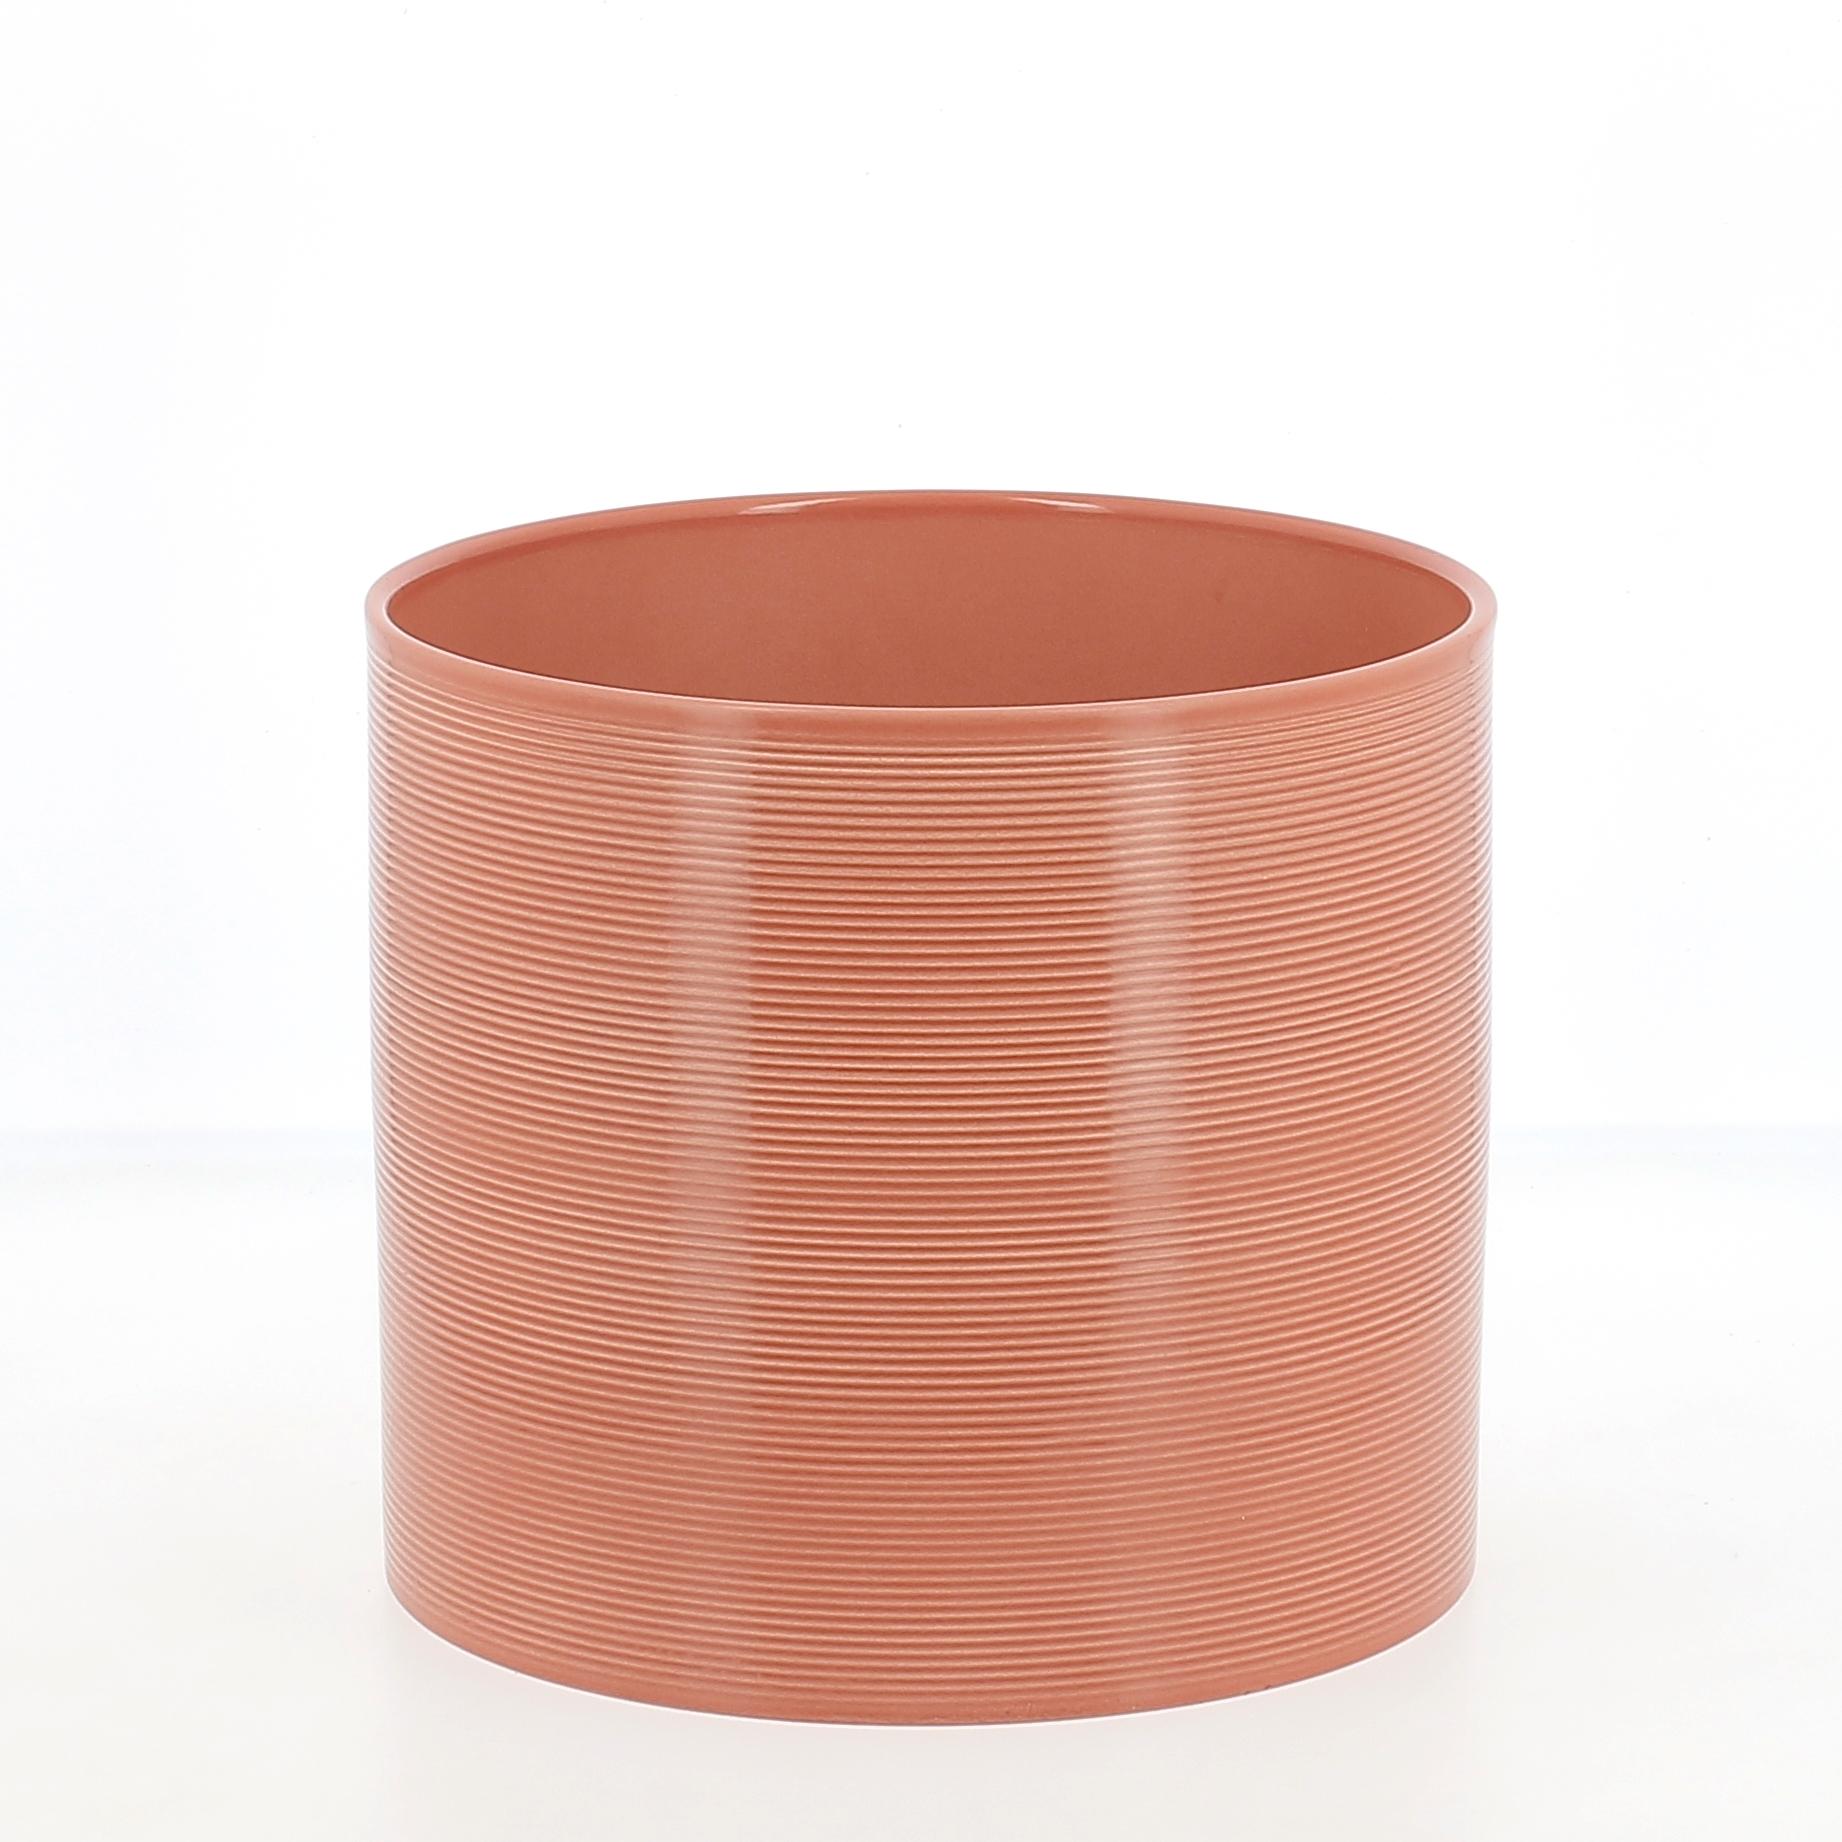 Vaso in ceramica papaya